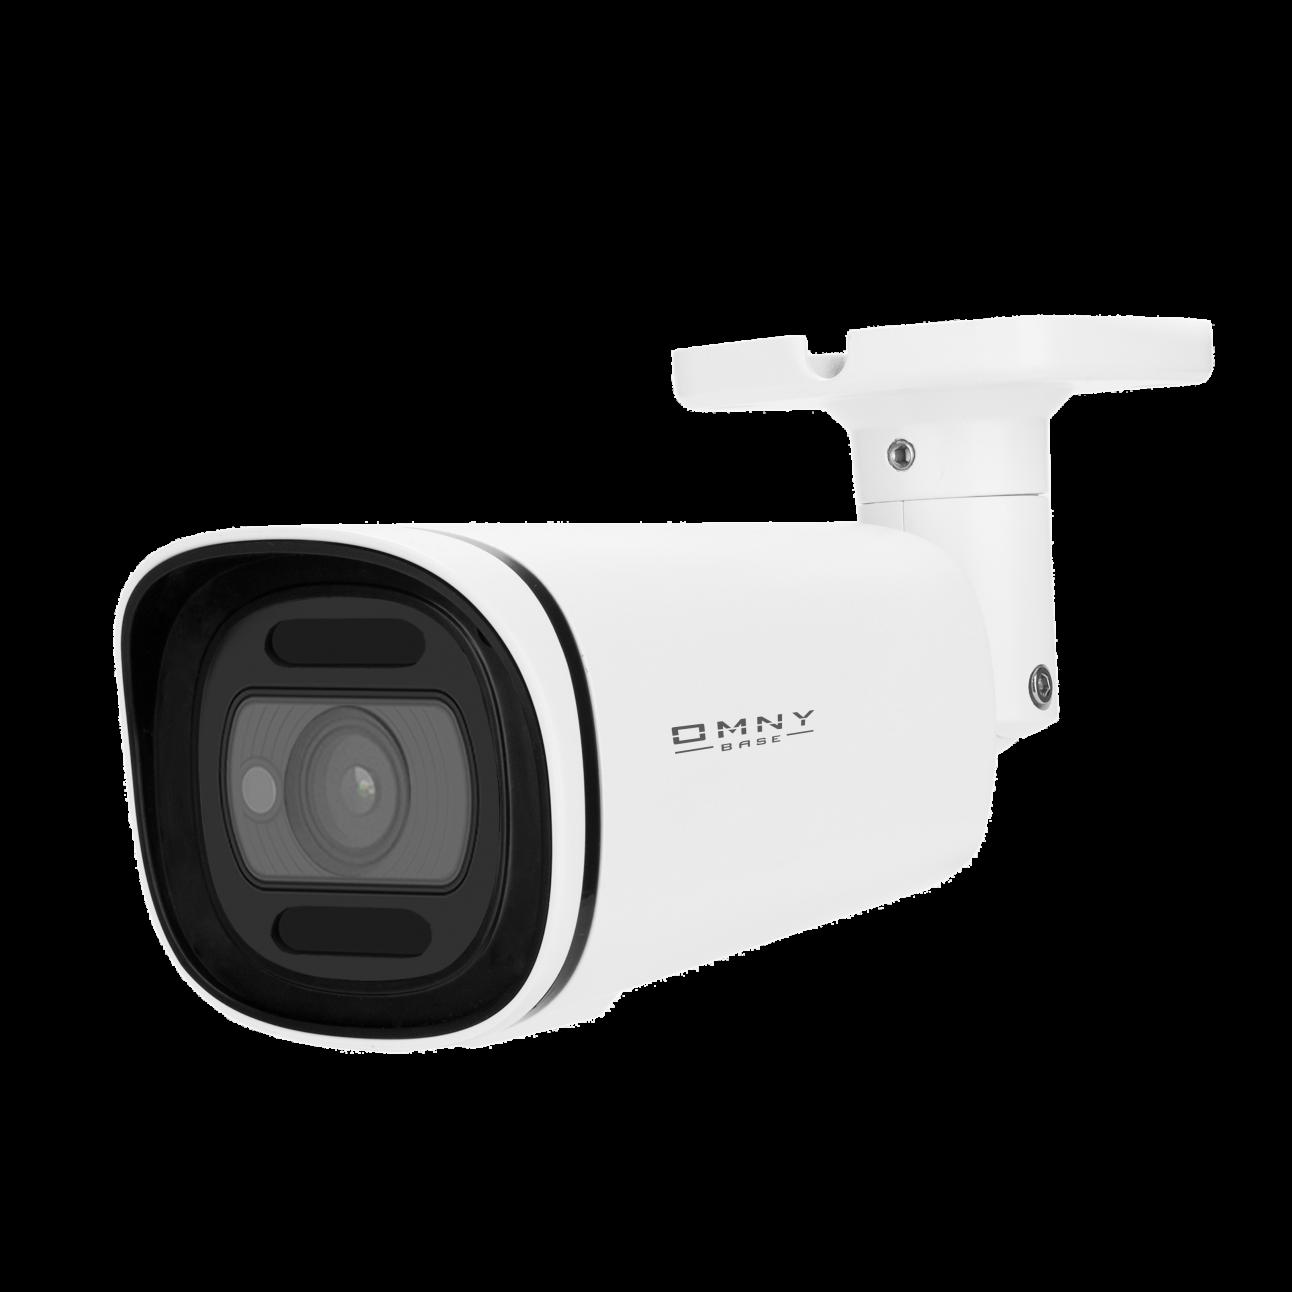 IP камера OMNY BASE ViBe5EZ-WDU, буллет, 5Мп (2592x1944), 25к/с, 2.7-13.5мм мотор. объектив, EasyMic, 12В DC, 802.3af, ИК до 50м, WDR 120dB, USB2.0